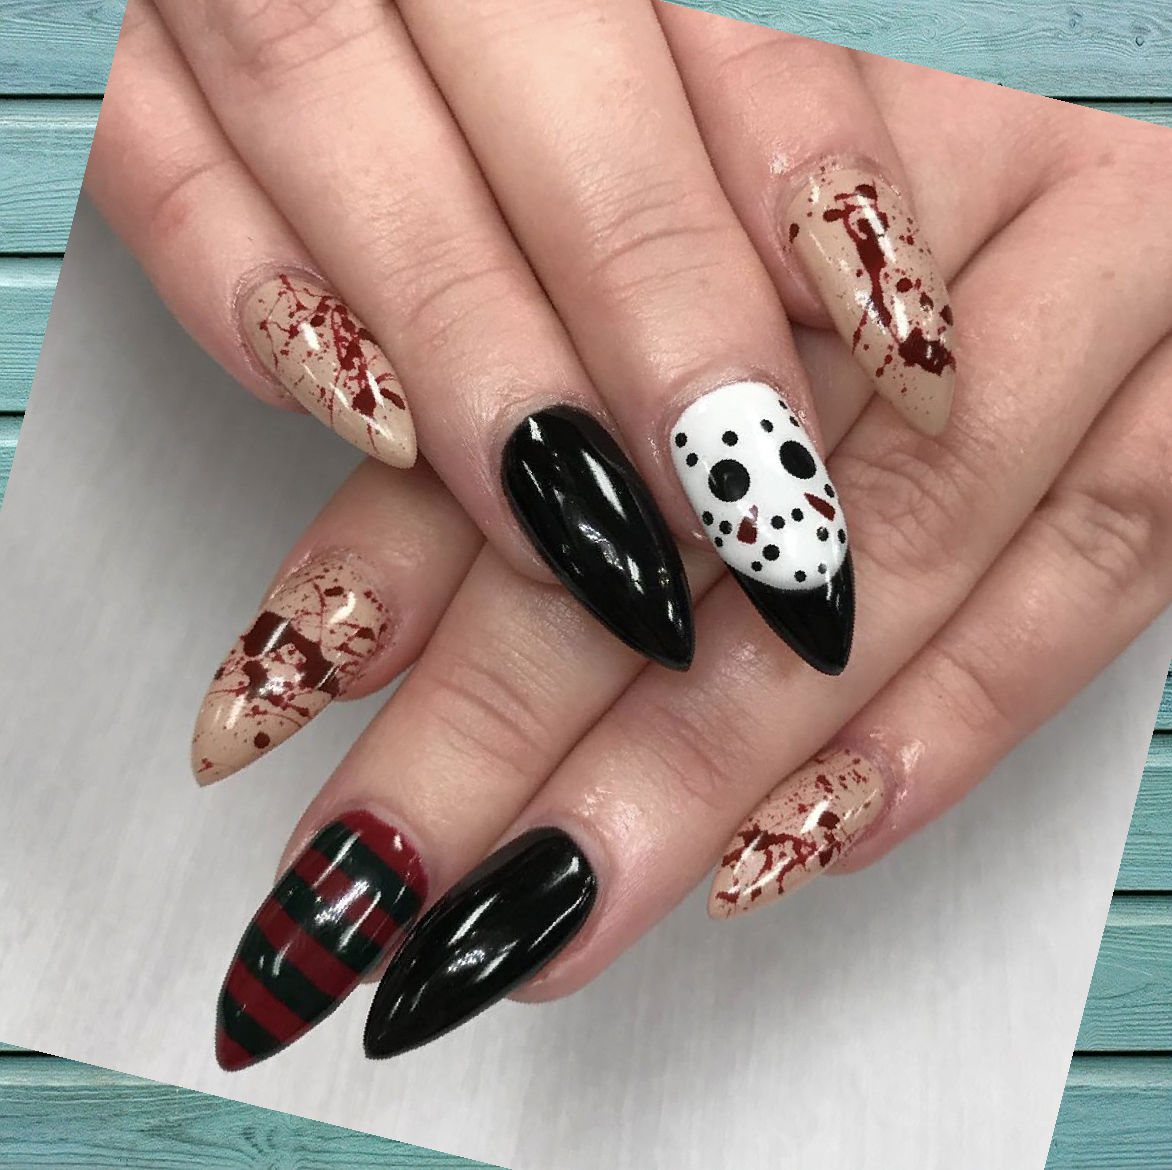 47 Halloween Nail Designs Halloween Nail Designs Coffin Halloween Nail Designs Cute 2020 In 2020 Cute Halloween Nails Horror Nails Holloween Nails